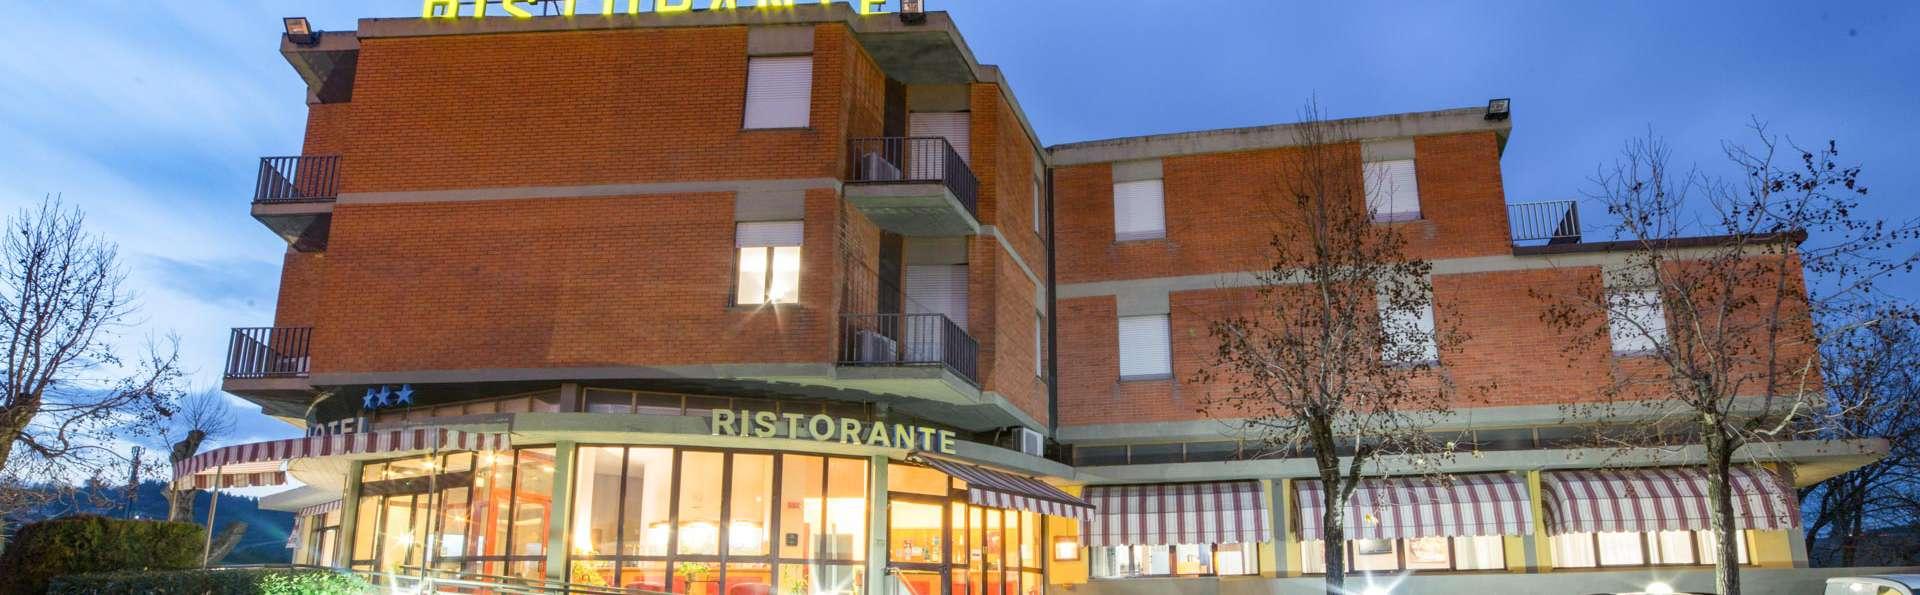 HG Hotel Europa - EDIT_FRONT_05.jpg